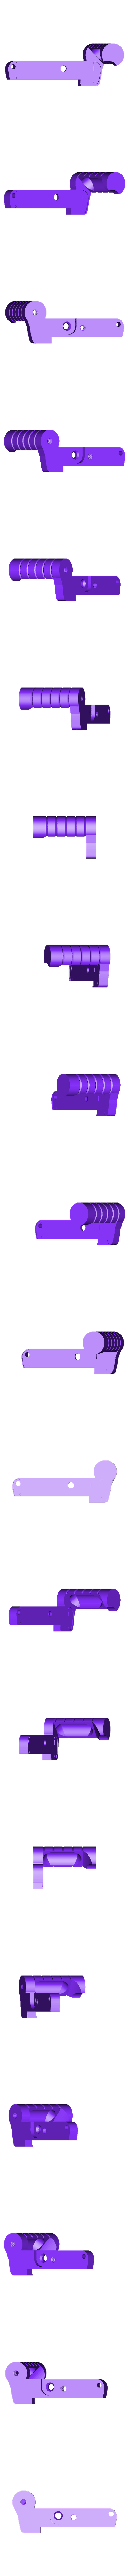 rx100m5a-bracket-grip.stl Download free STL file Sony DSC RX100VA RX100M5A Bracket Grip Extension • 3D print template, whoopsie